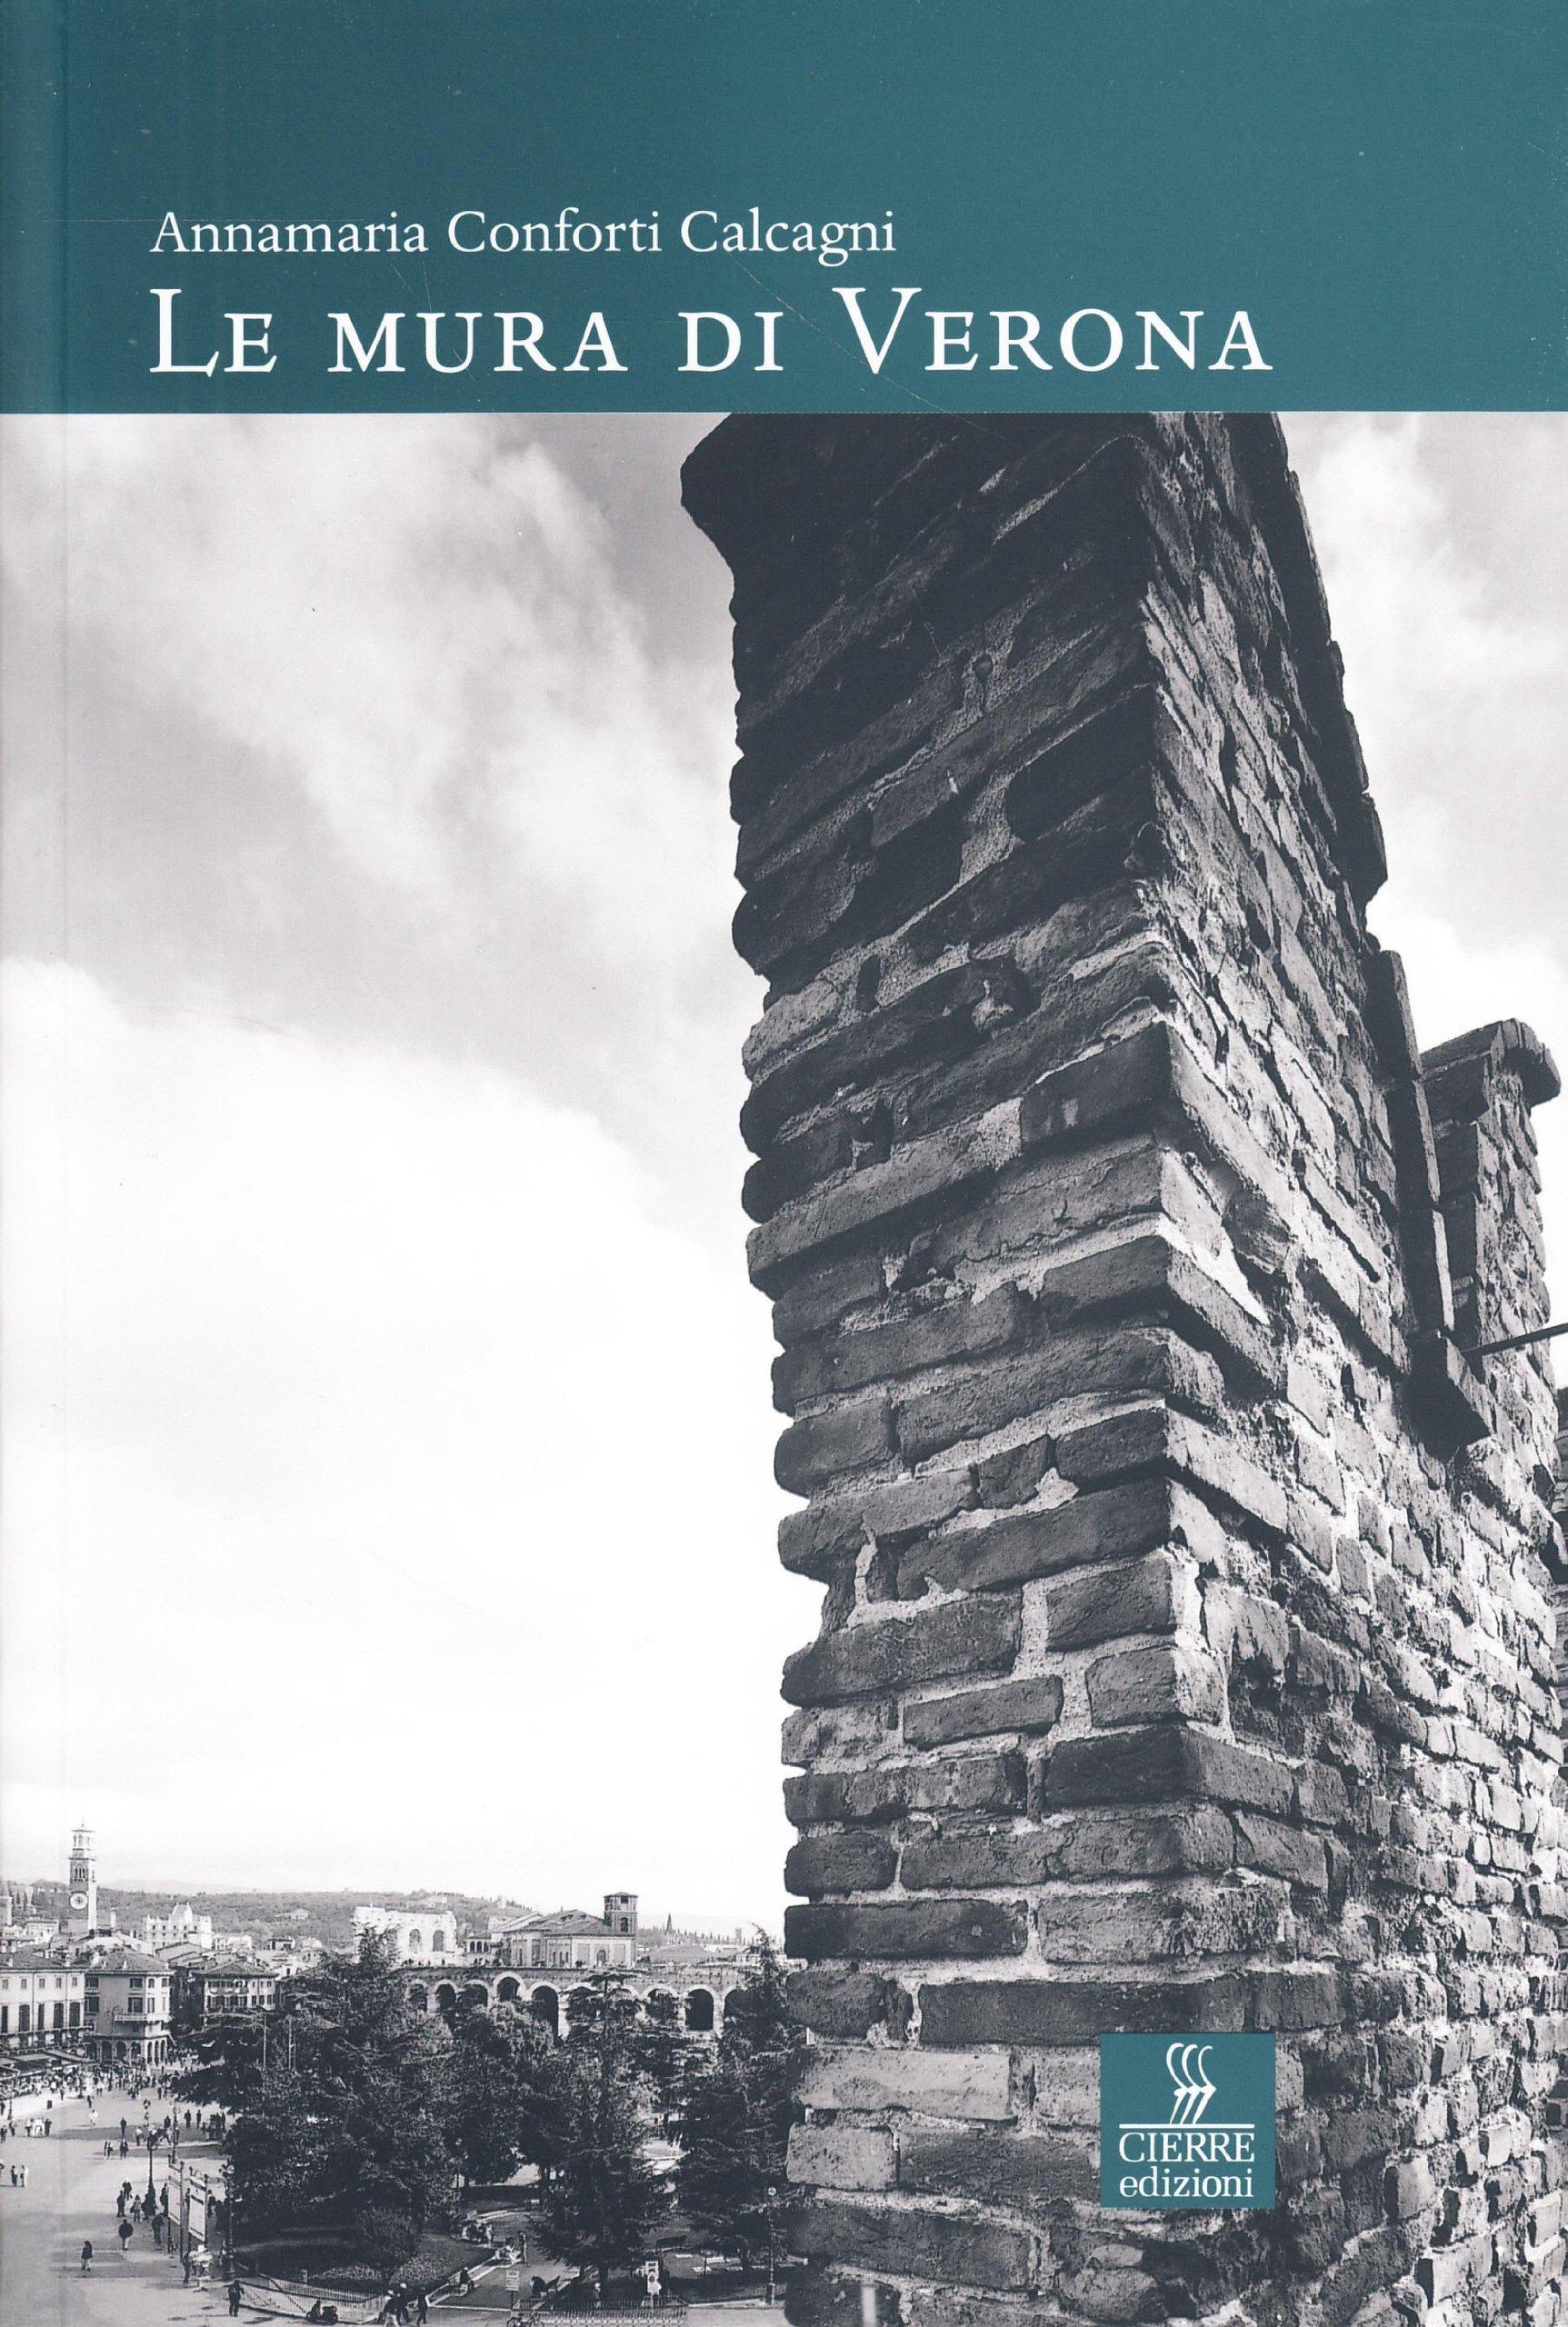 Le mura di Verona